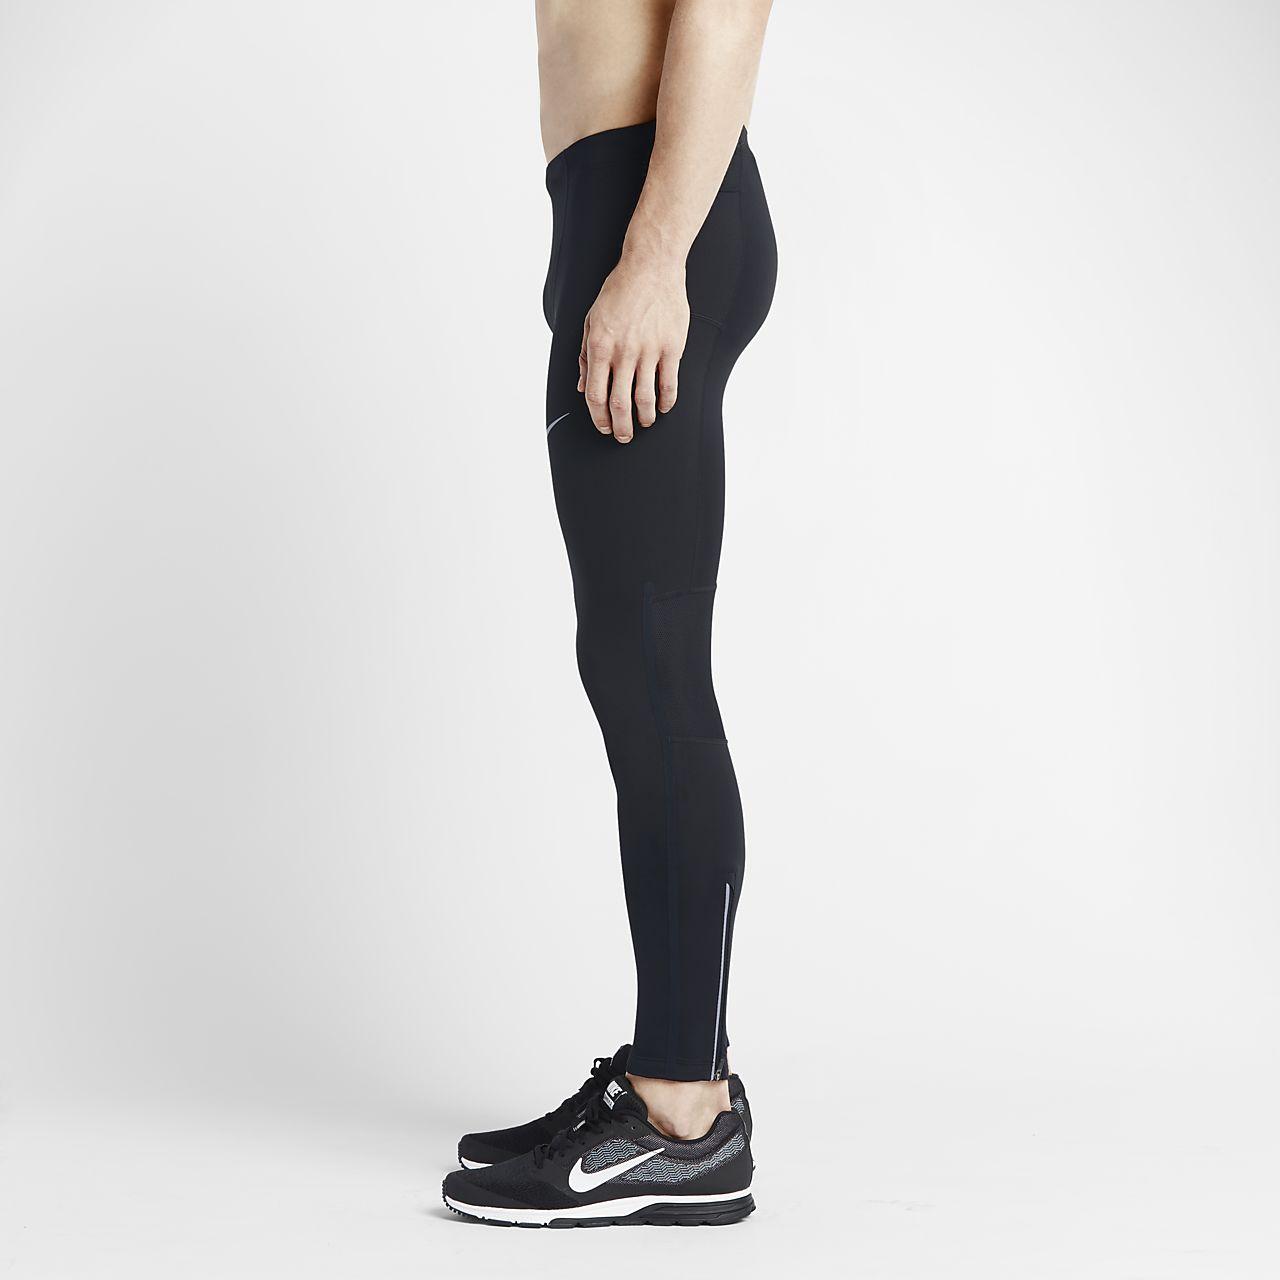 Pour Nike Homme Power De Tech Collant Running wPX0ONnk8